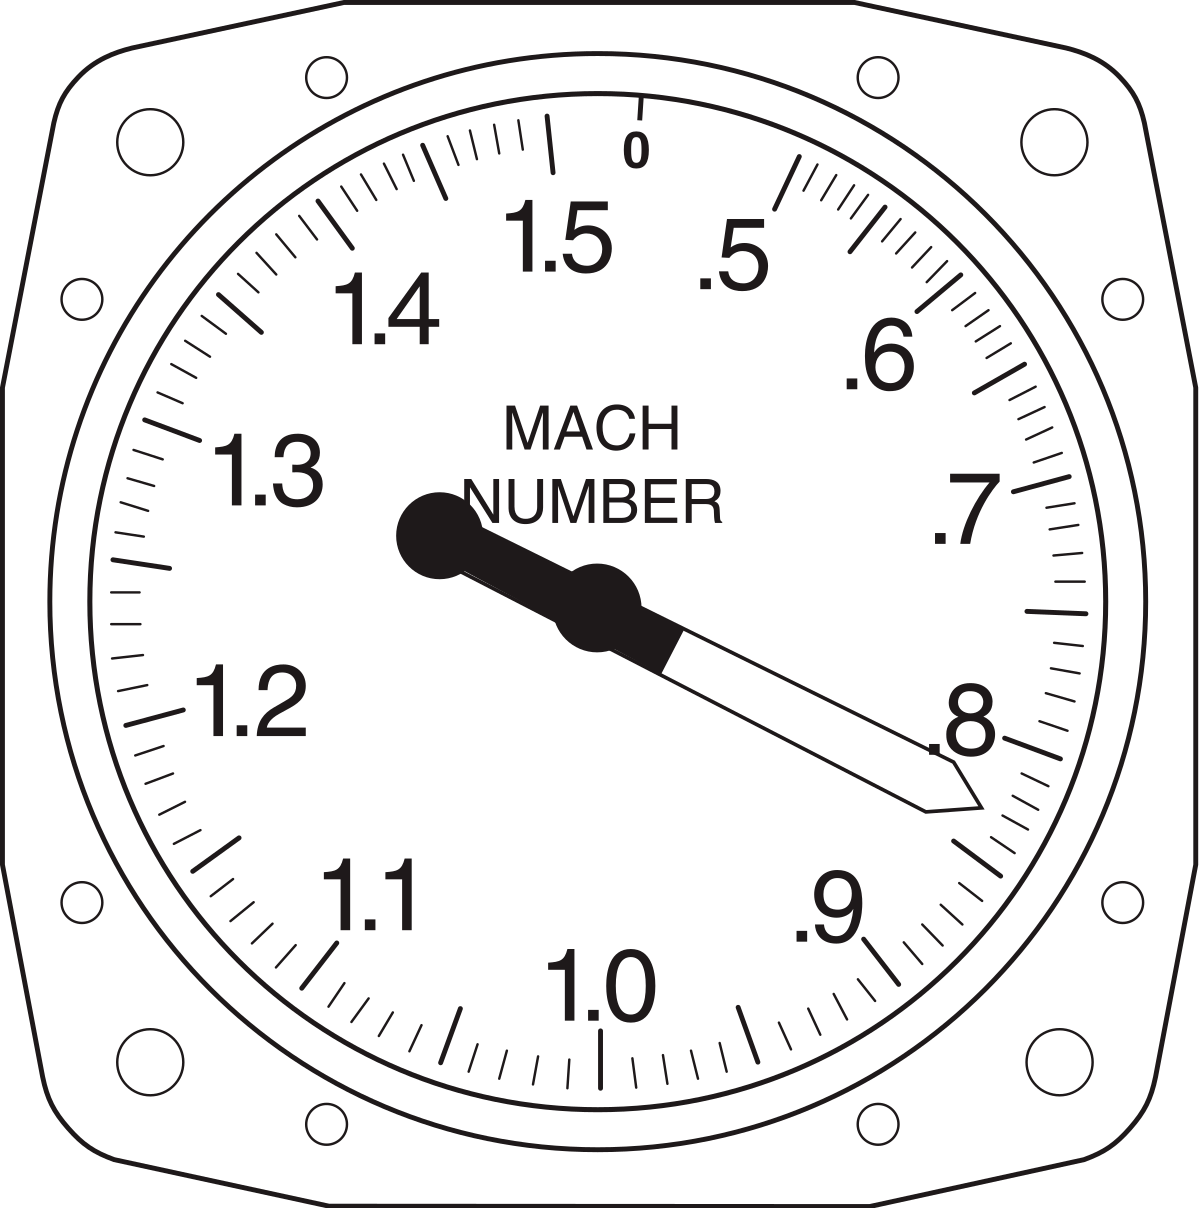 Machmeter